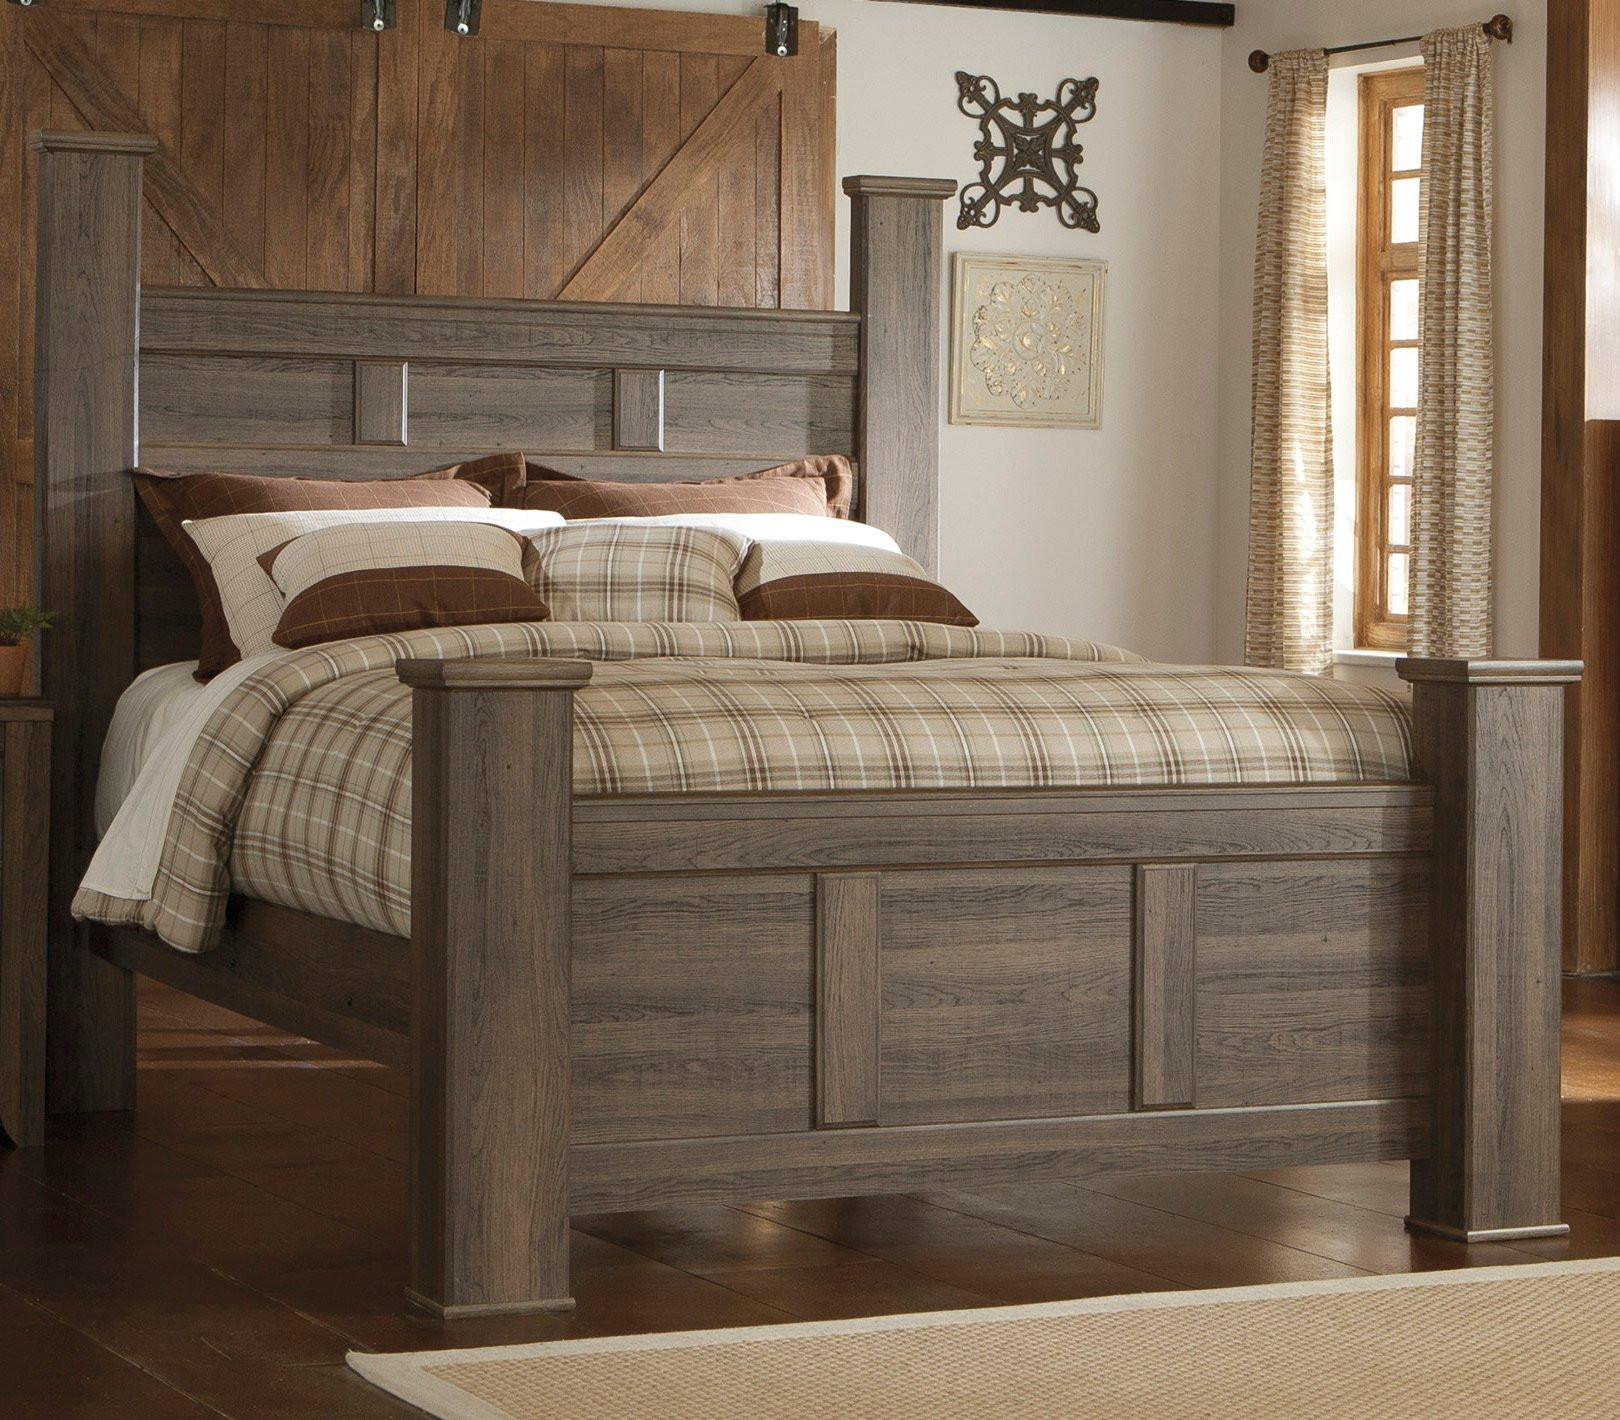 Rustic Bedroom Set King  Driftwood Rustic Modern 6 Piece King Bedroom Set Fairfax